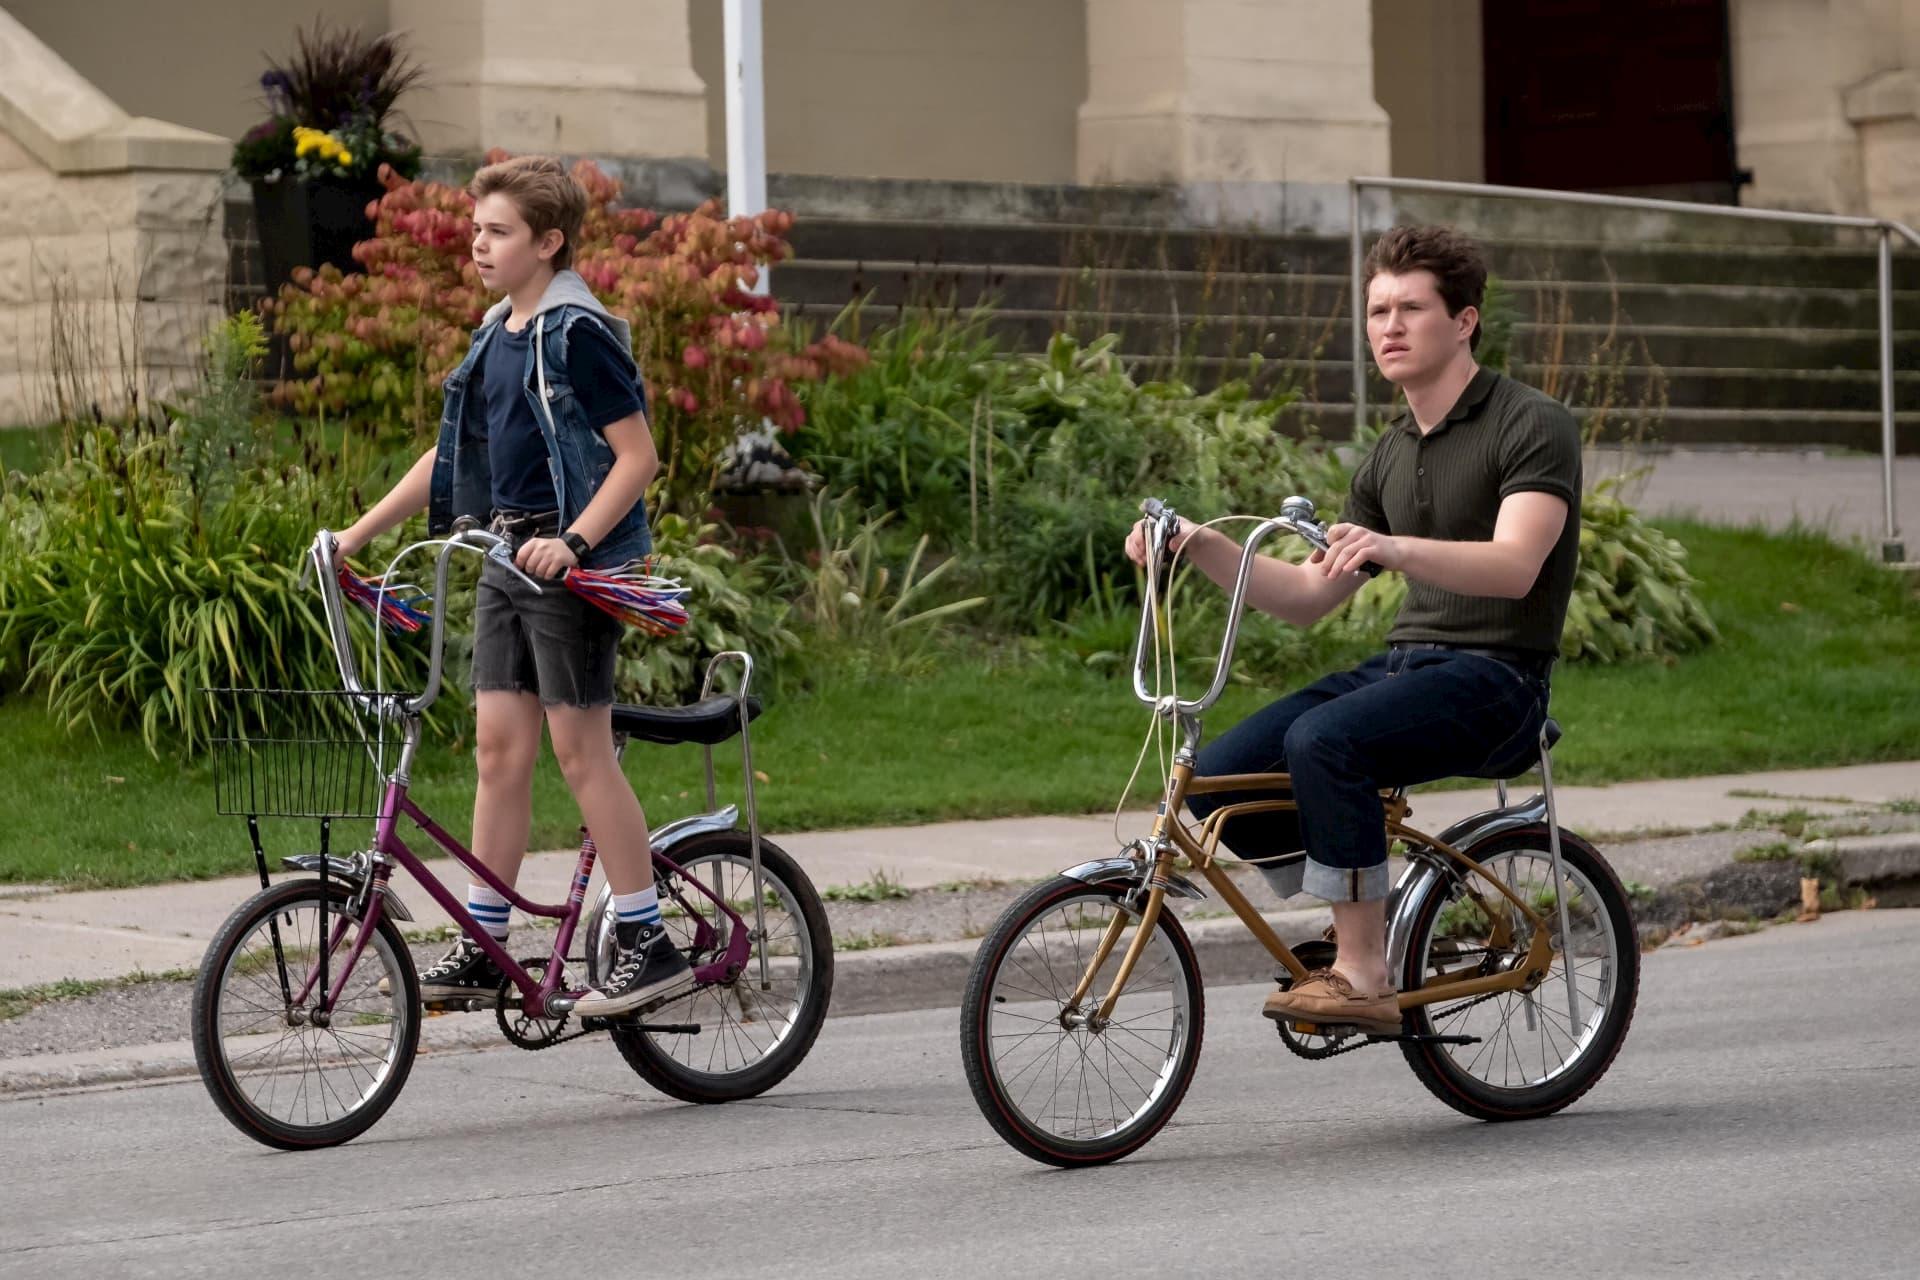 2 boys on banana seat bikes